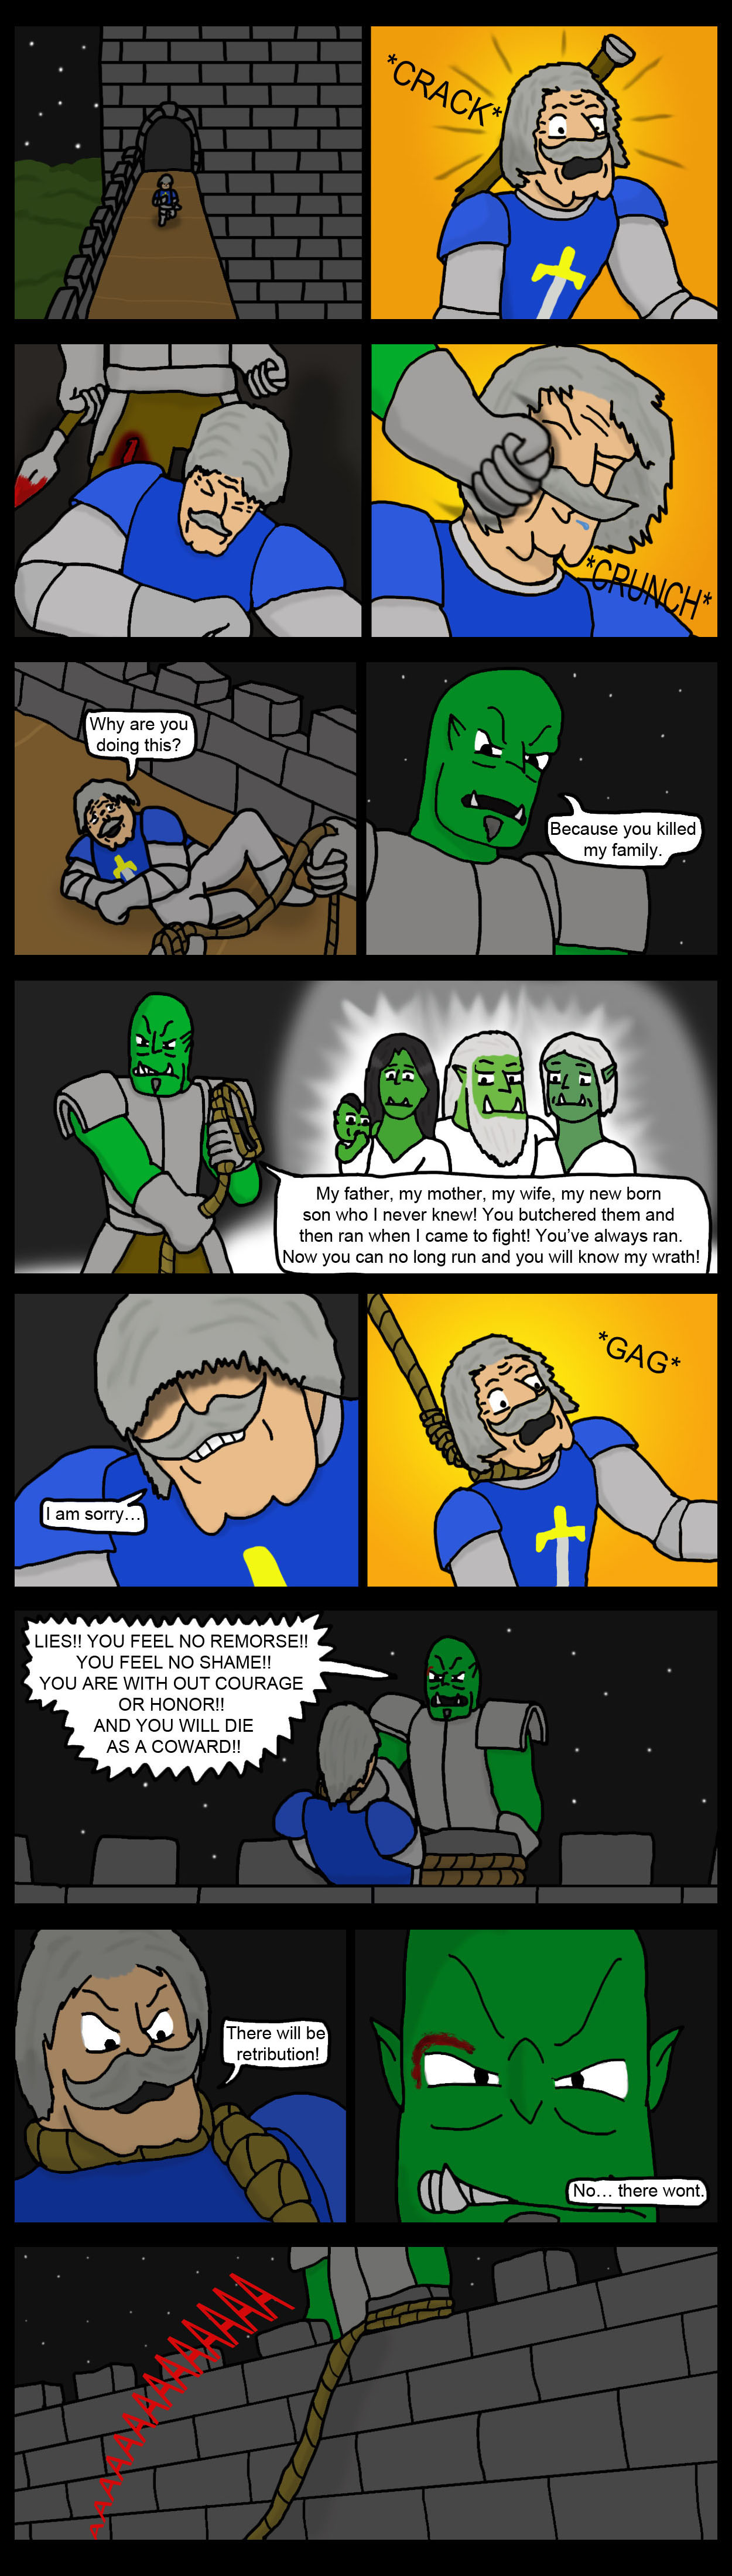 Gorak's Revenge